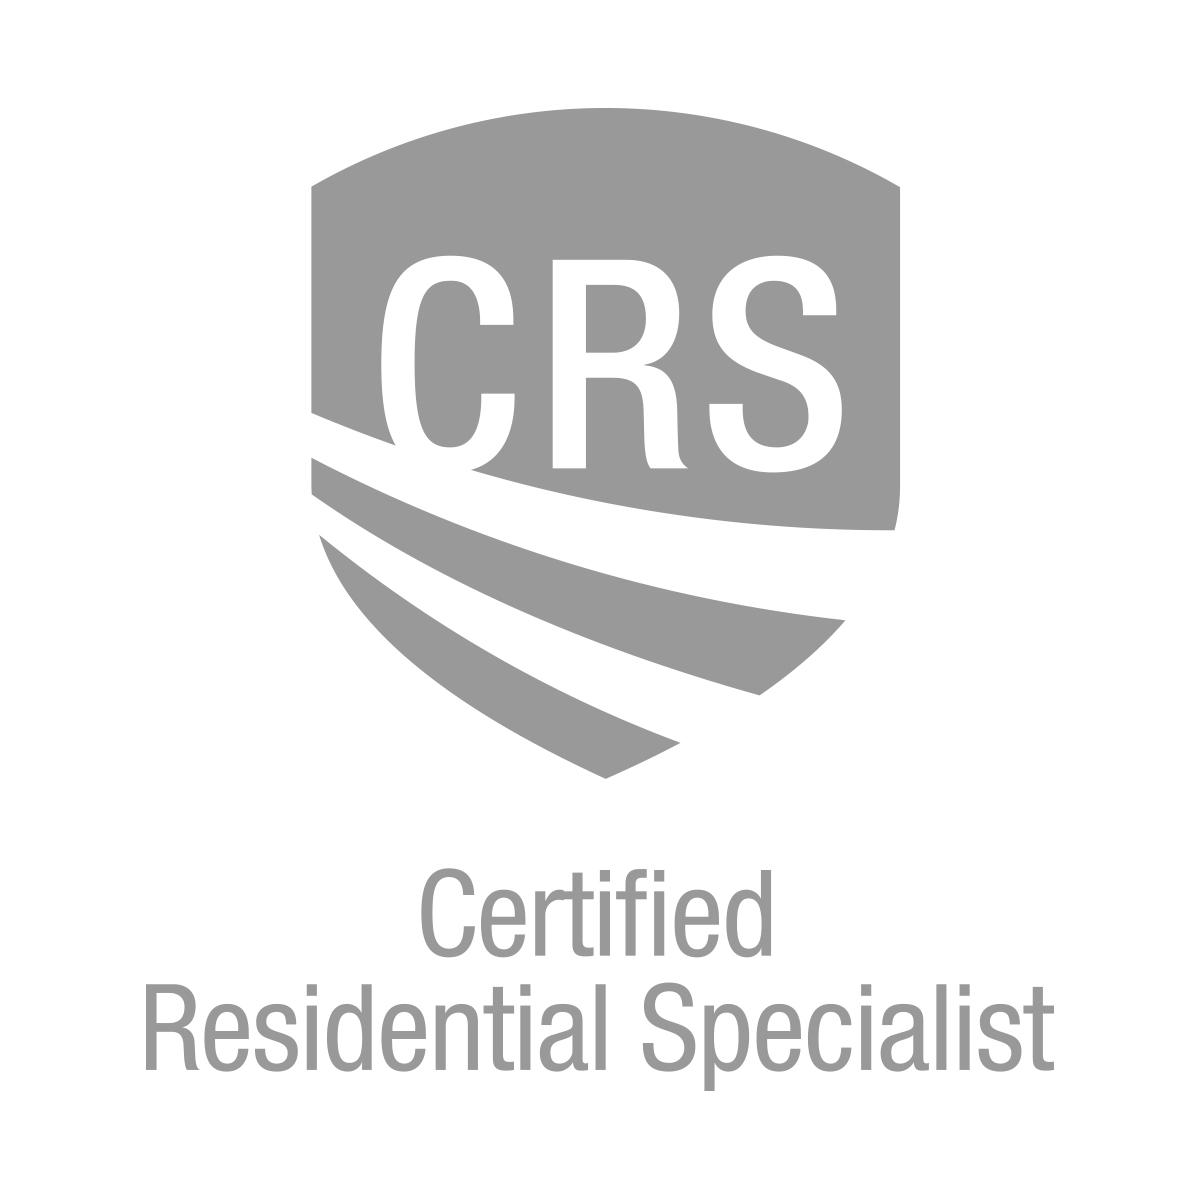 CRS-logo-1200px.jpg